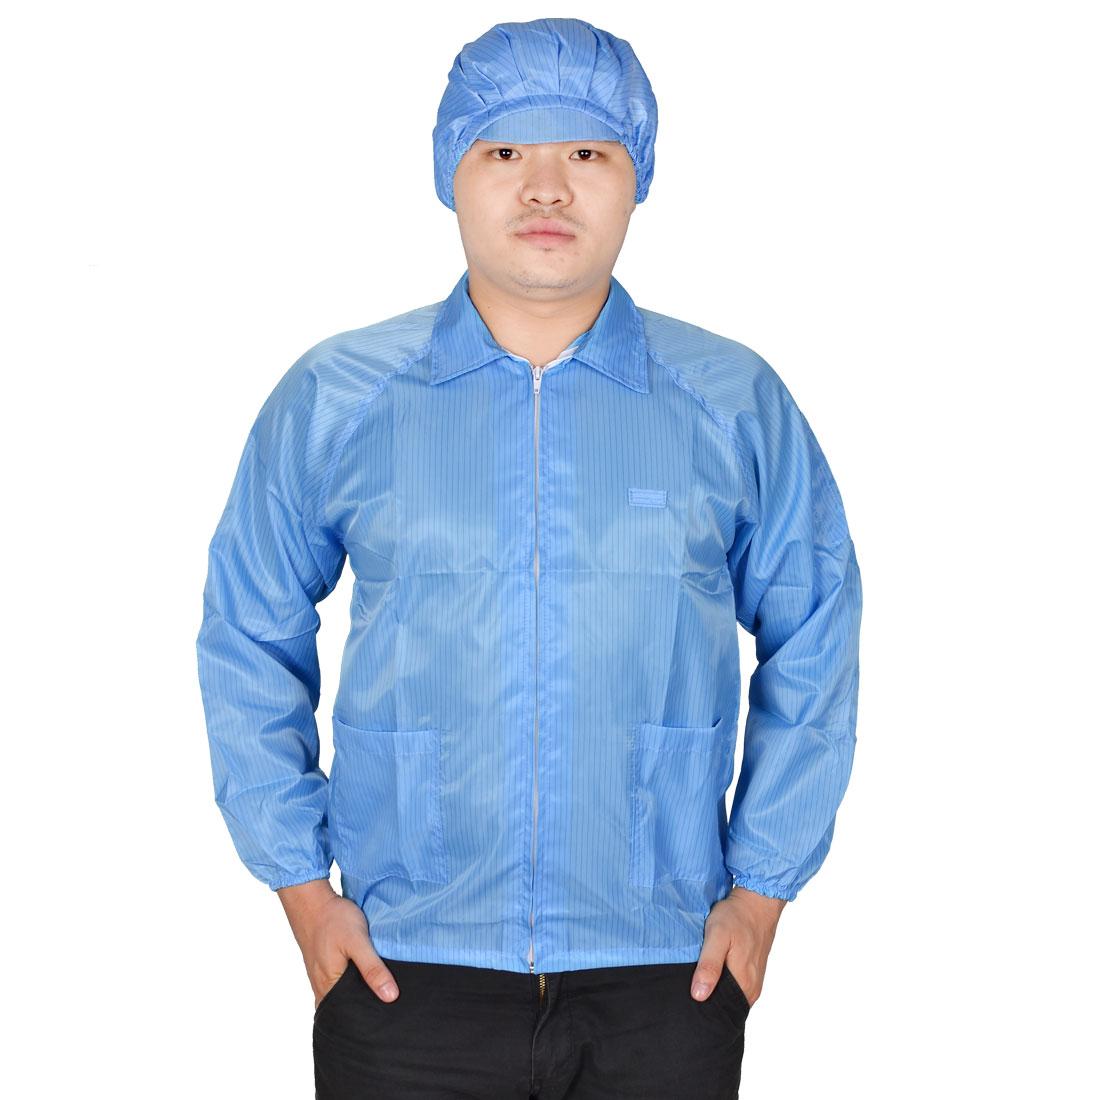 Man Lady Pinstripe Print Point Collar Anti Static Jacket Garment Blue M